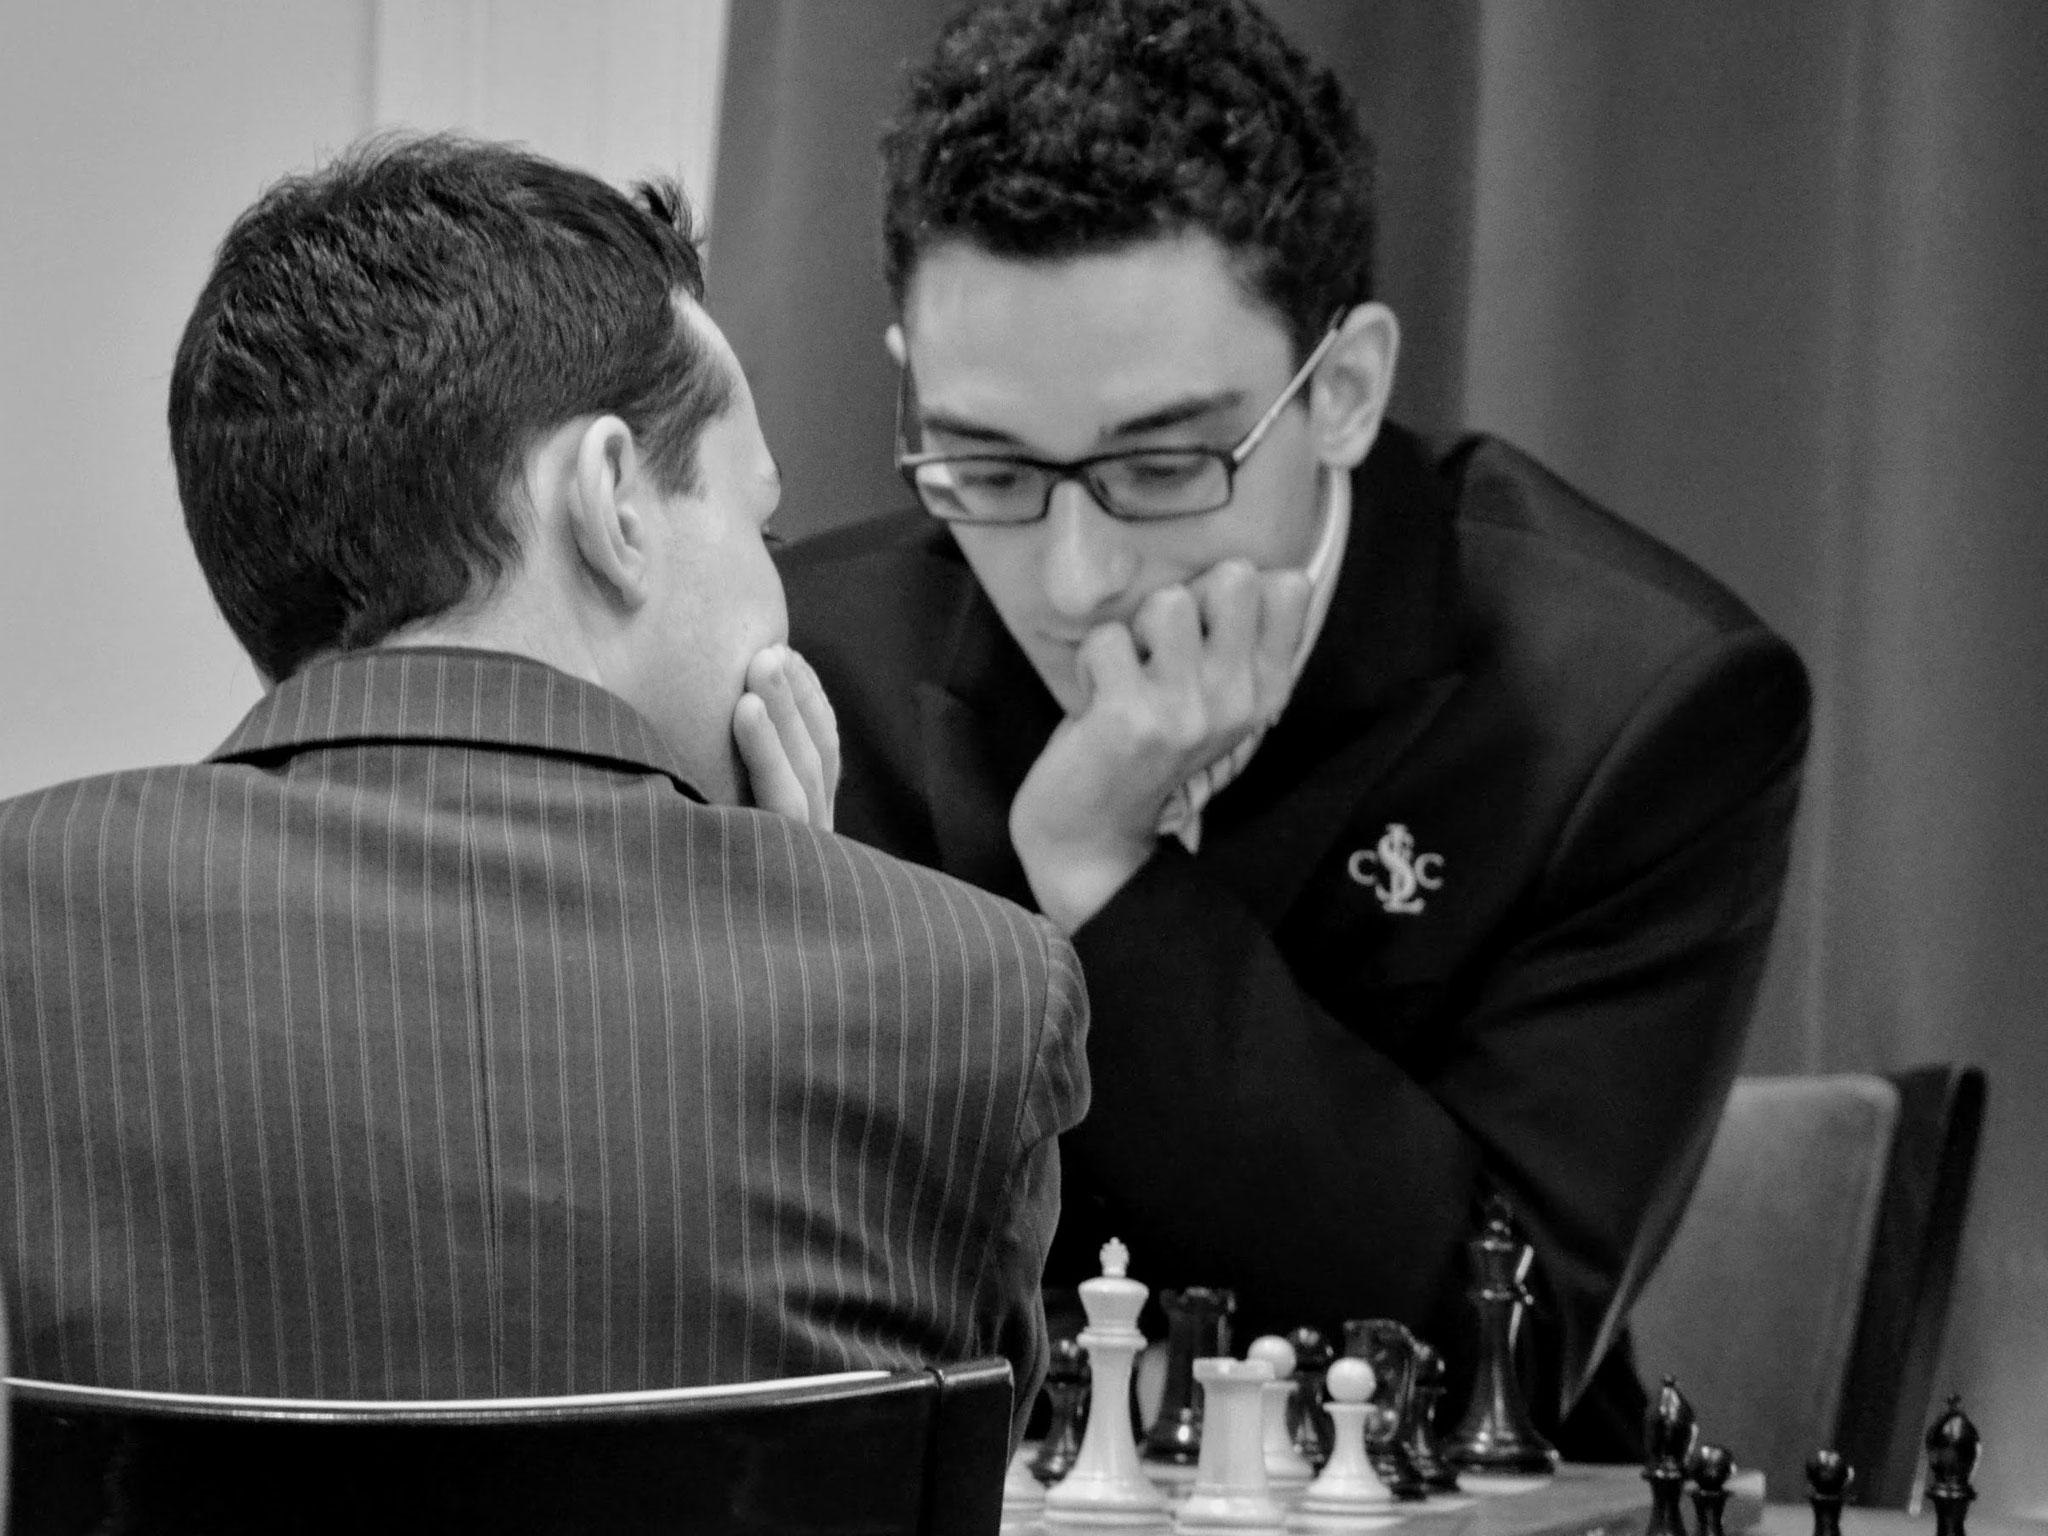 St. Louis - 2016 - Alexandr Lenderman, Fabiano Caruana - U.S. Chess Championship